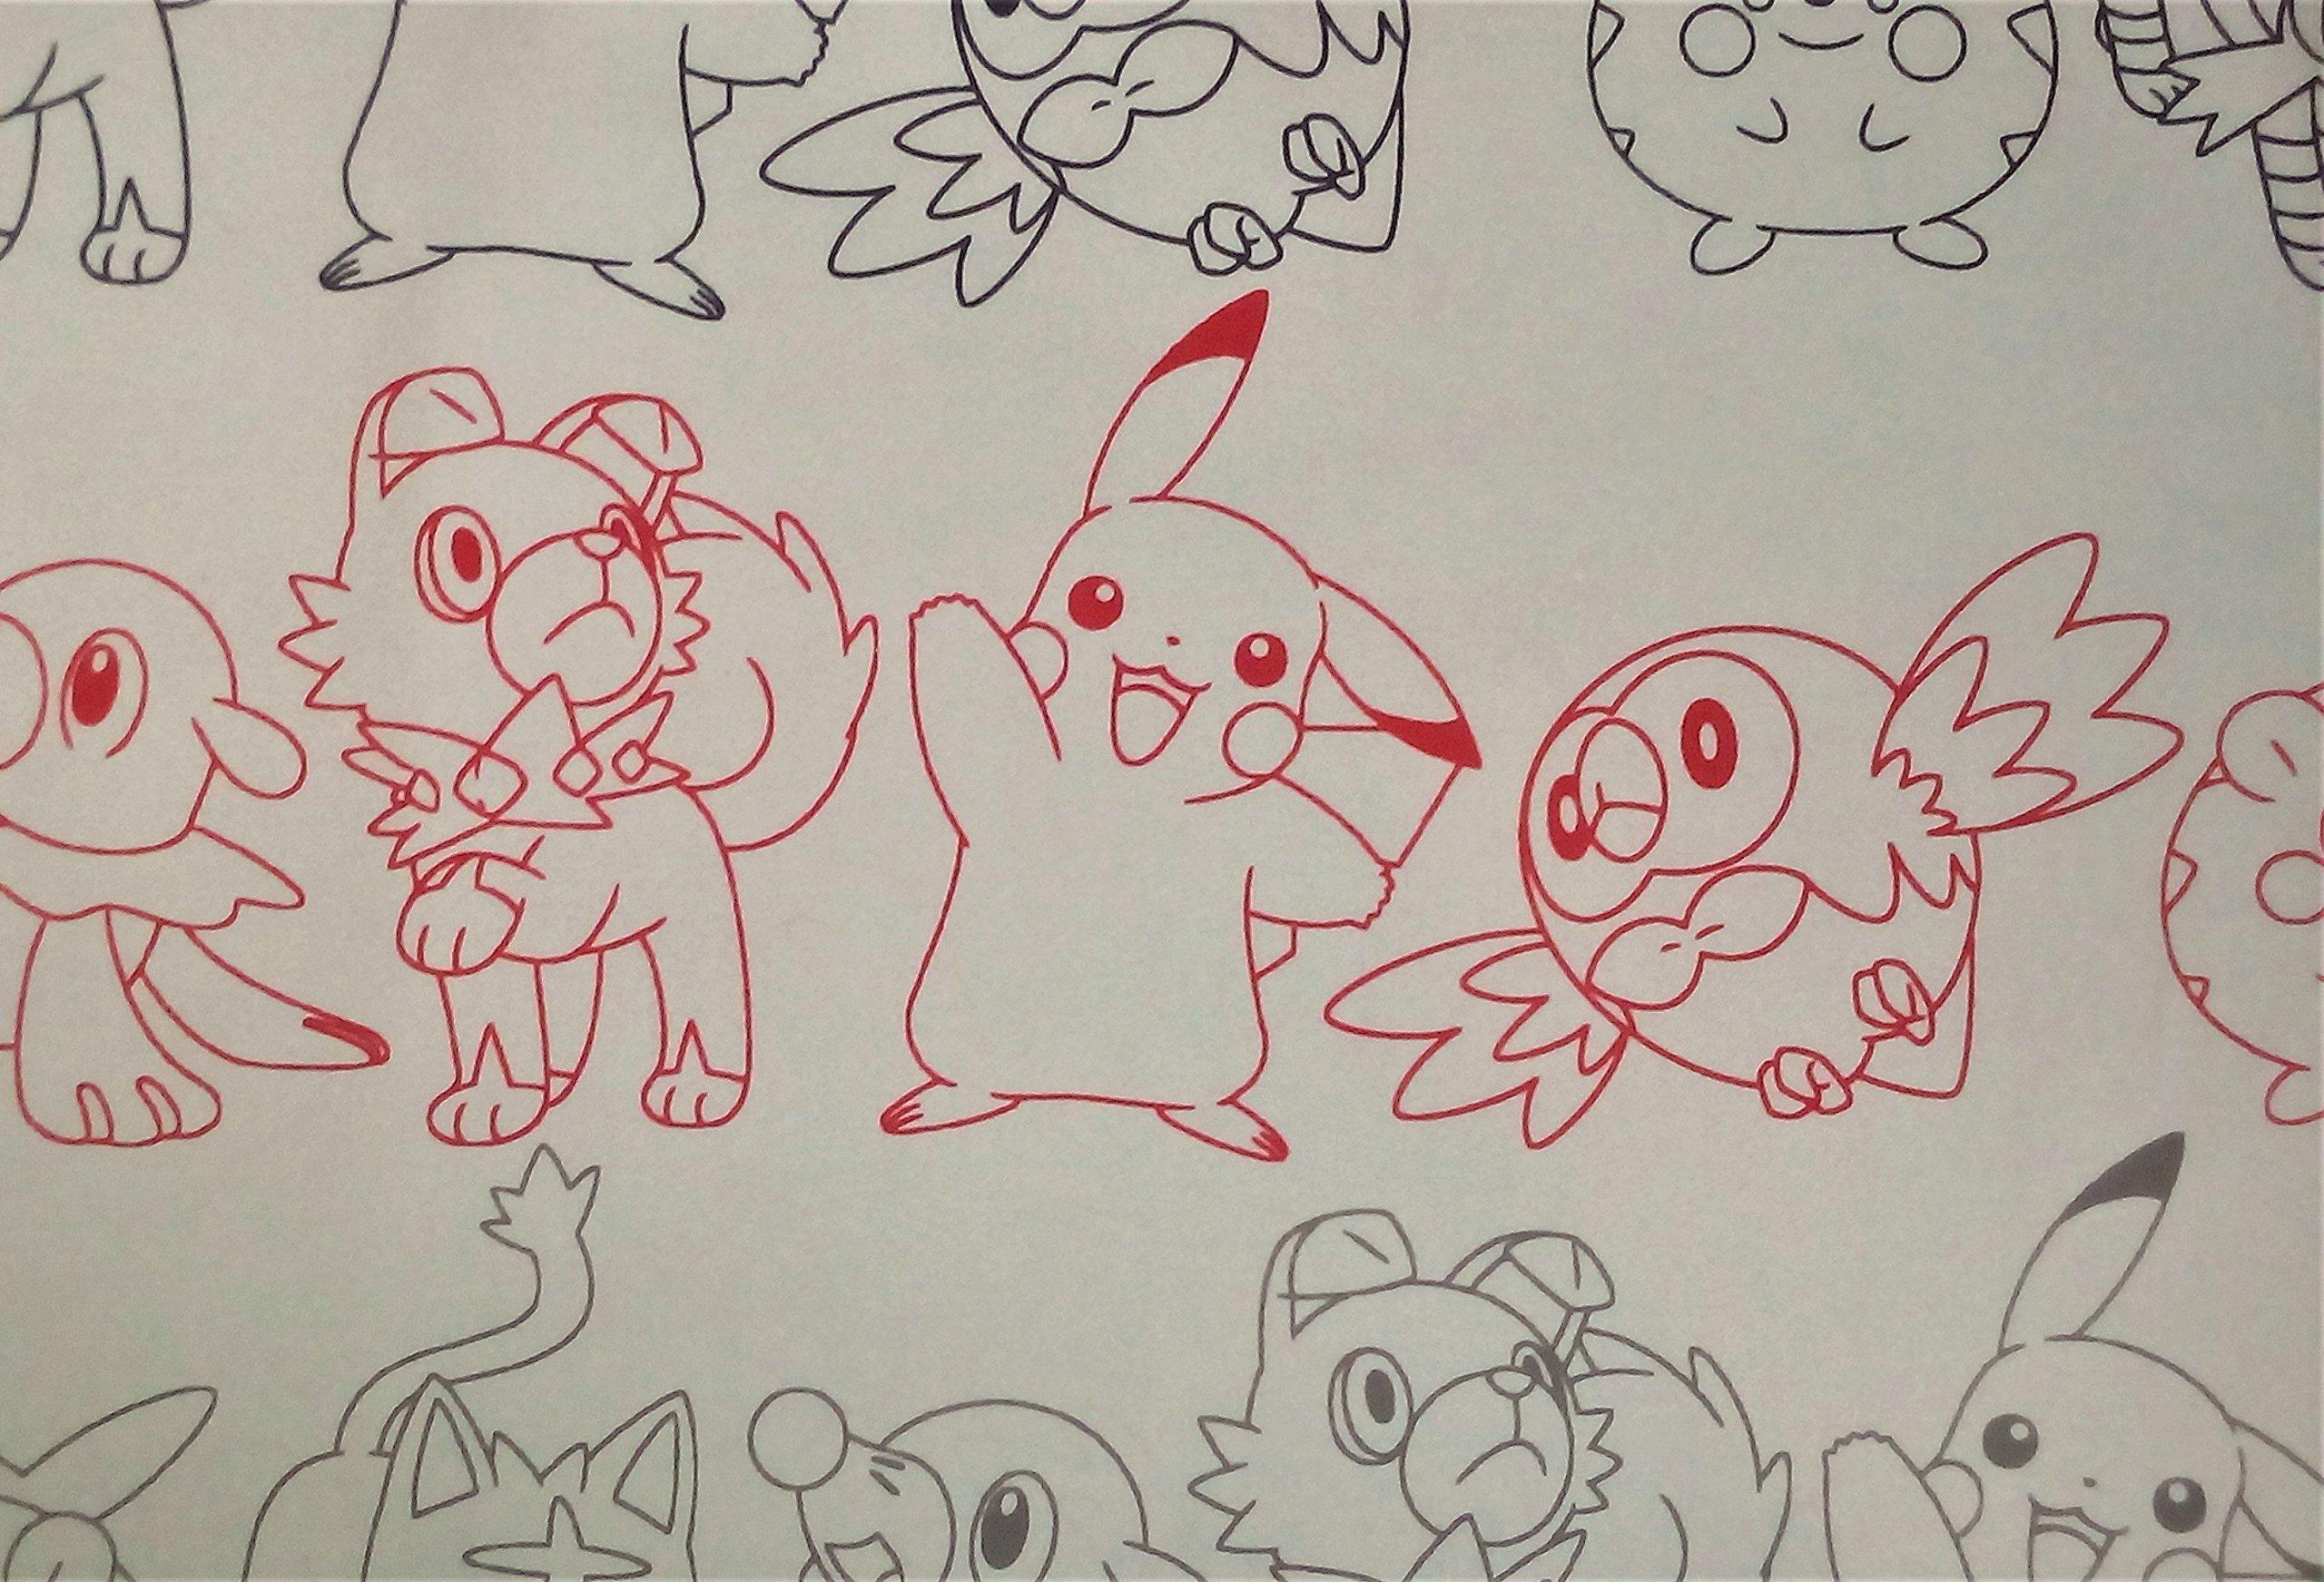 Pokemon Pikachu Prize Card Images 100% Polyester (FLAT SHEET ONLY) Size FULL Boys Girls Kids Bedding